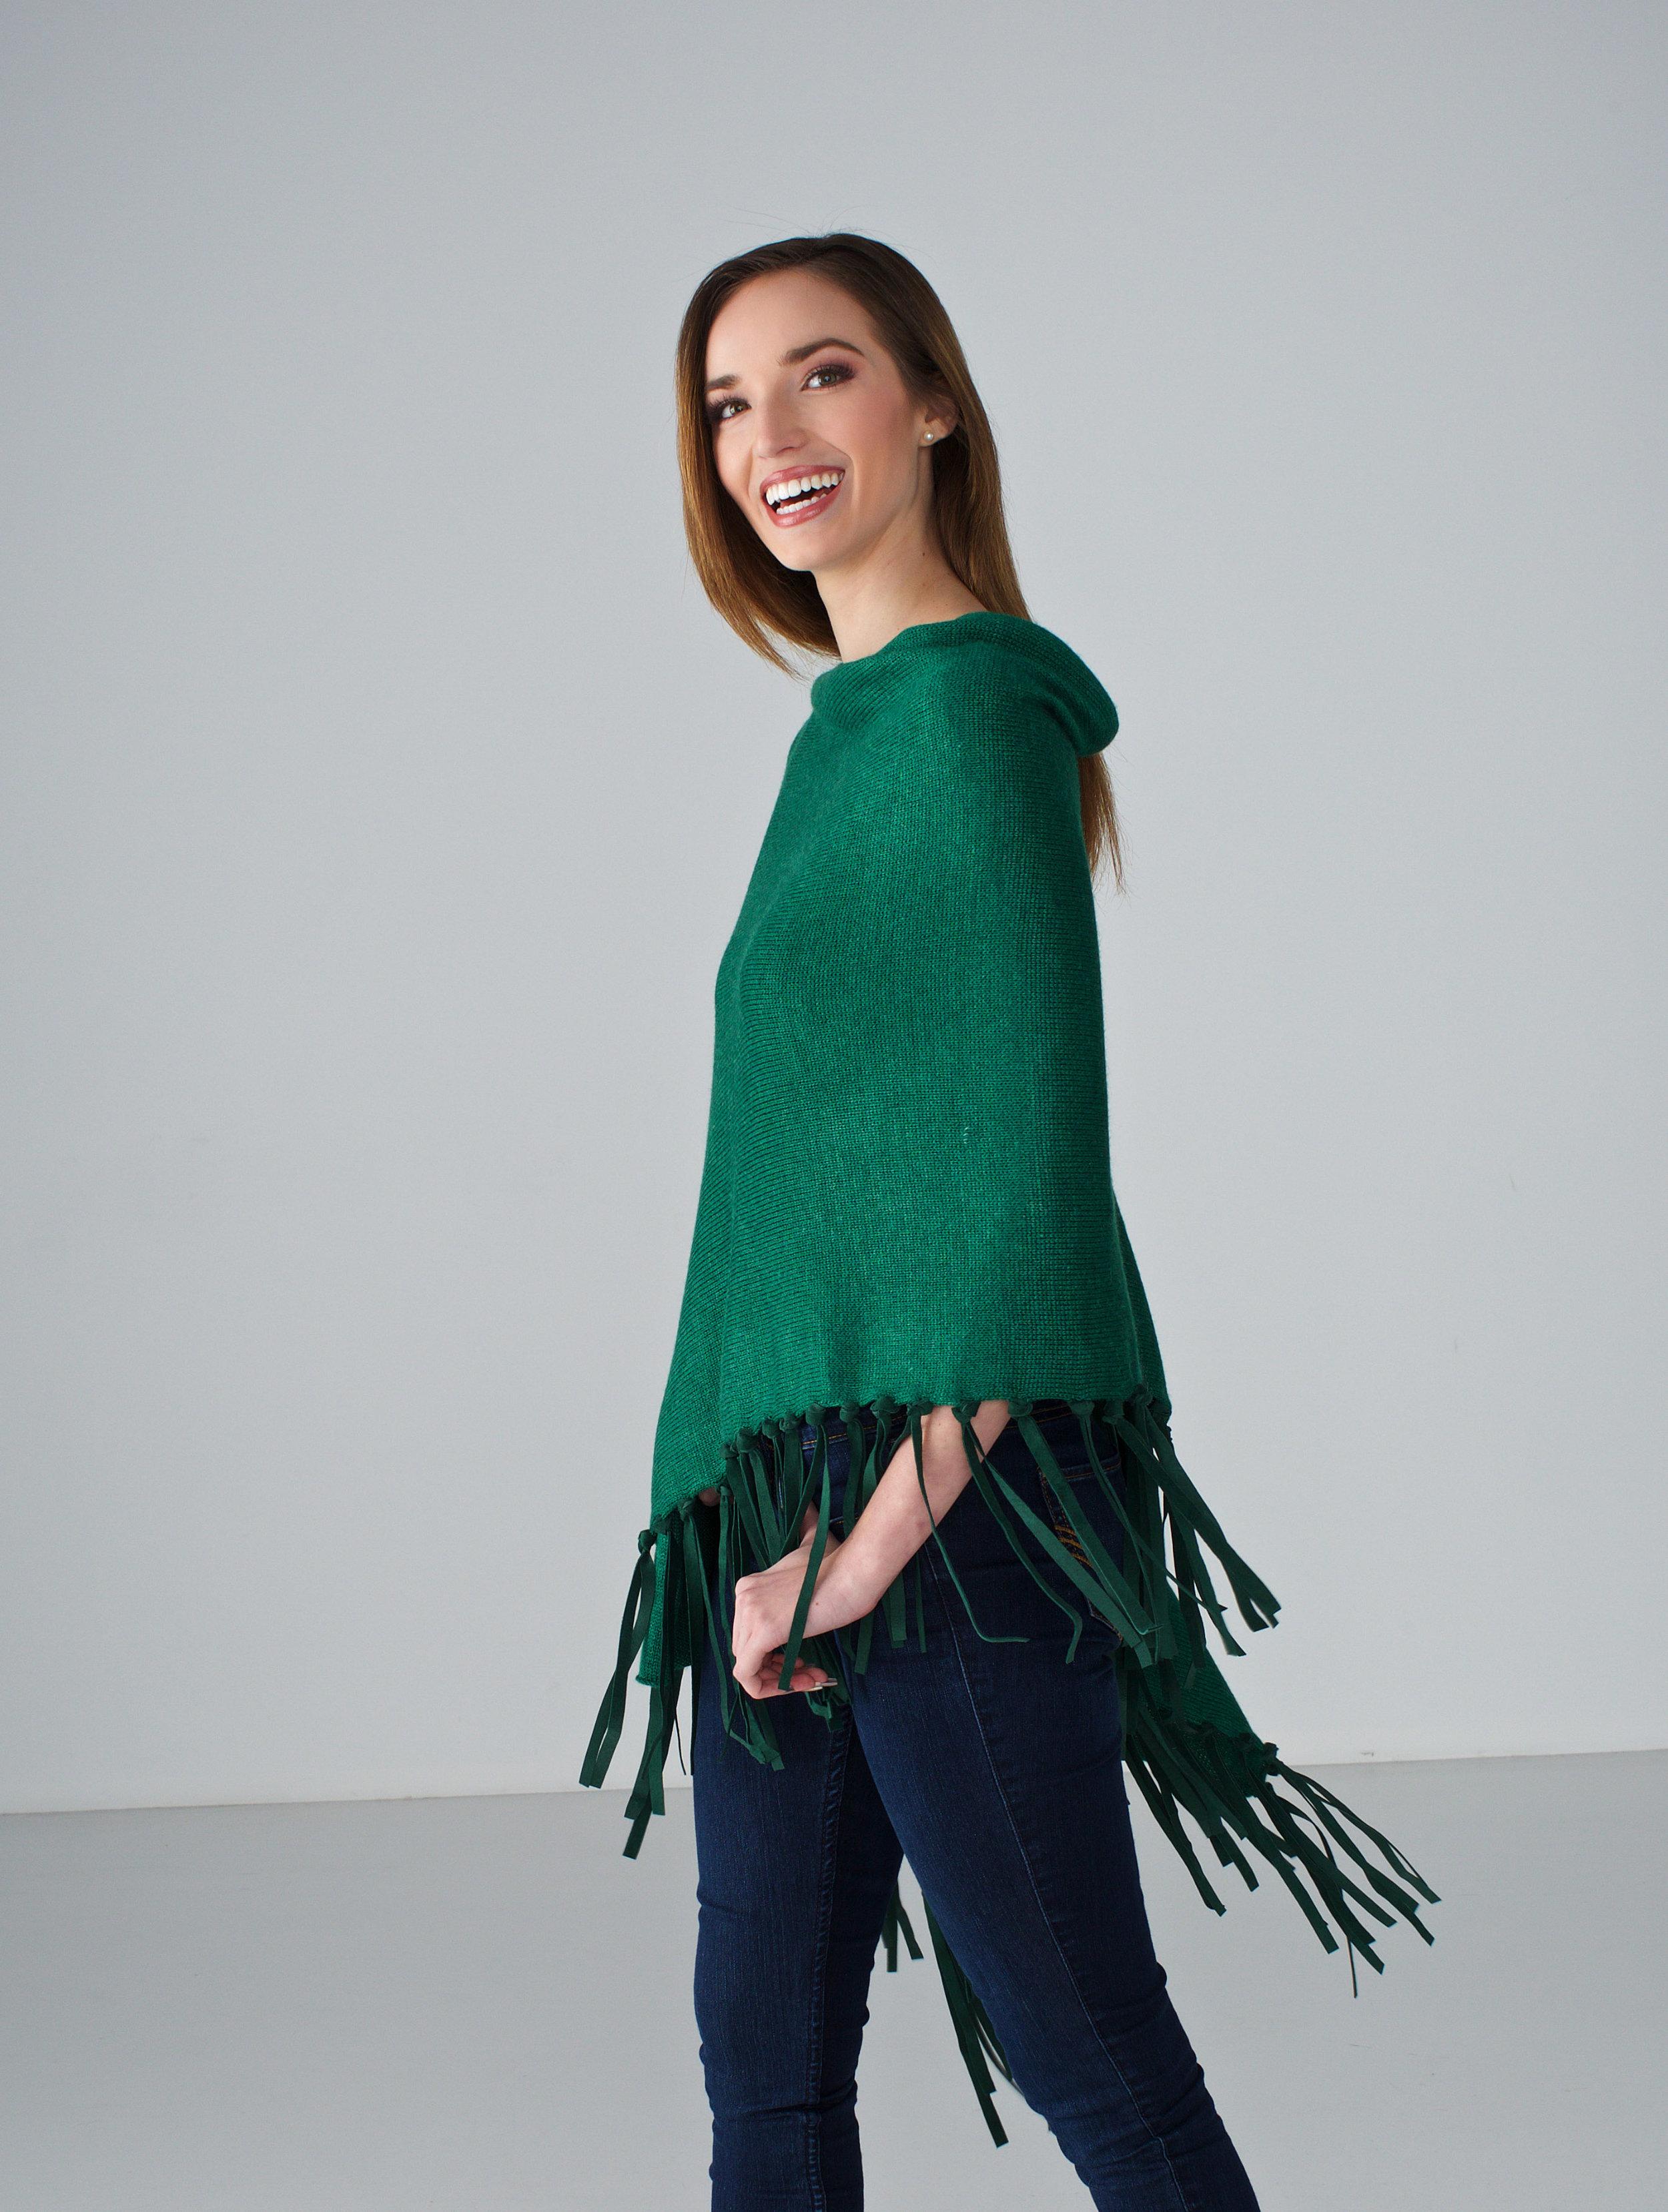 emerald wrap leatherC01B6107.jpg